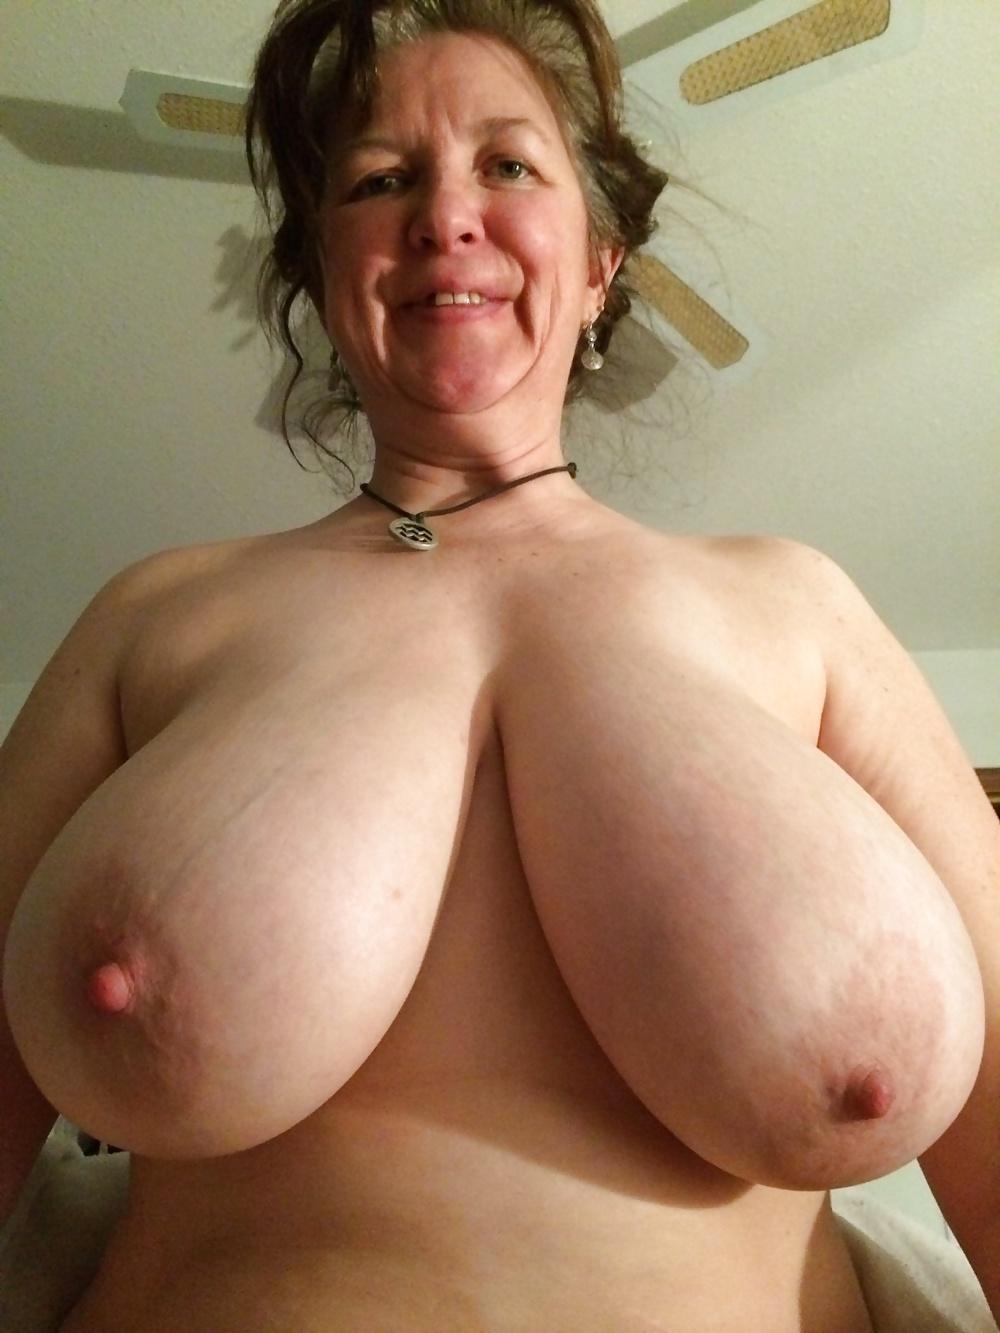 Chubby tit grandma nude